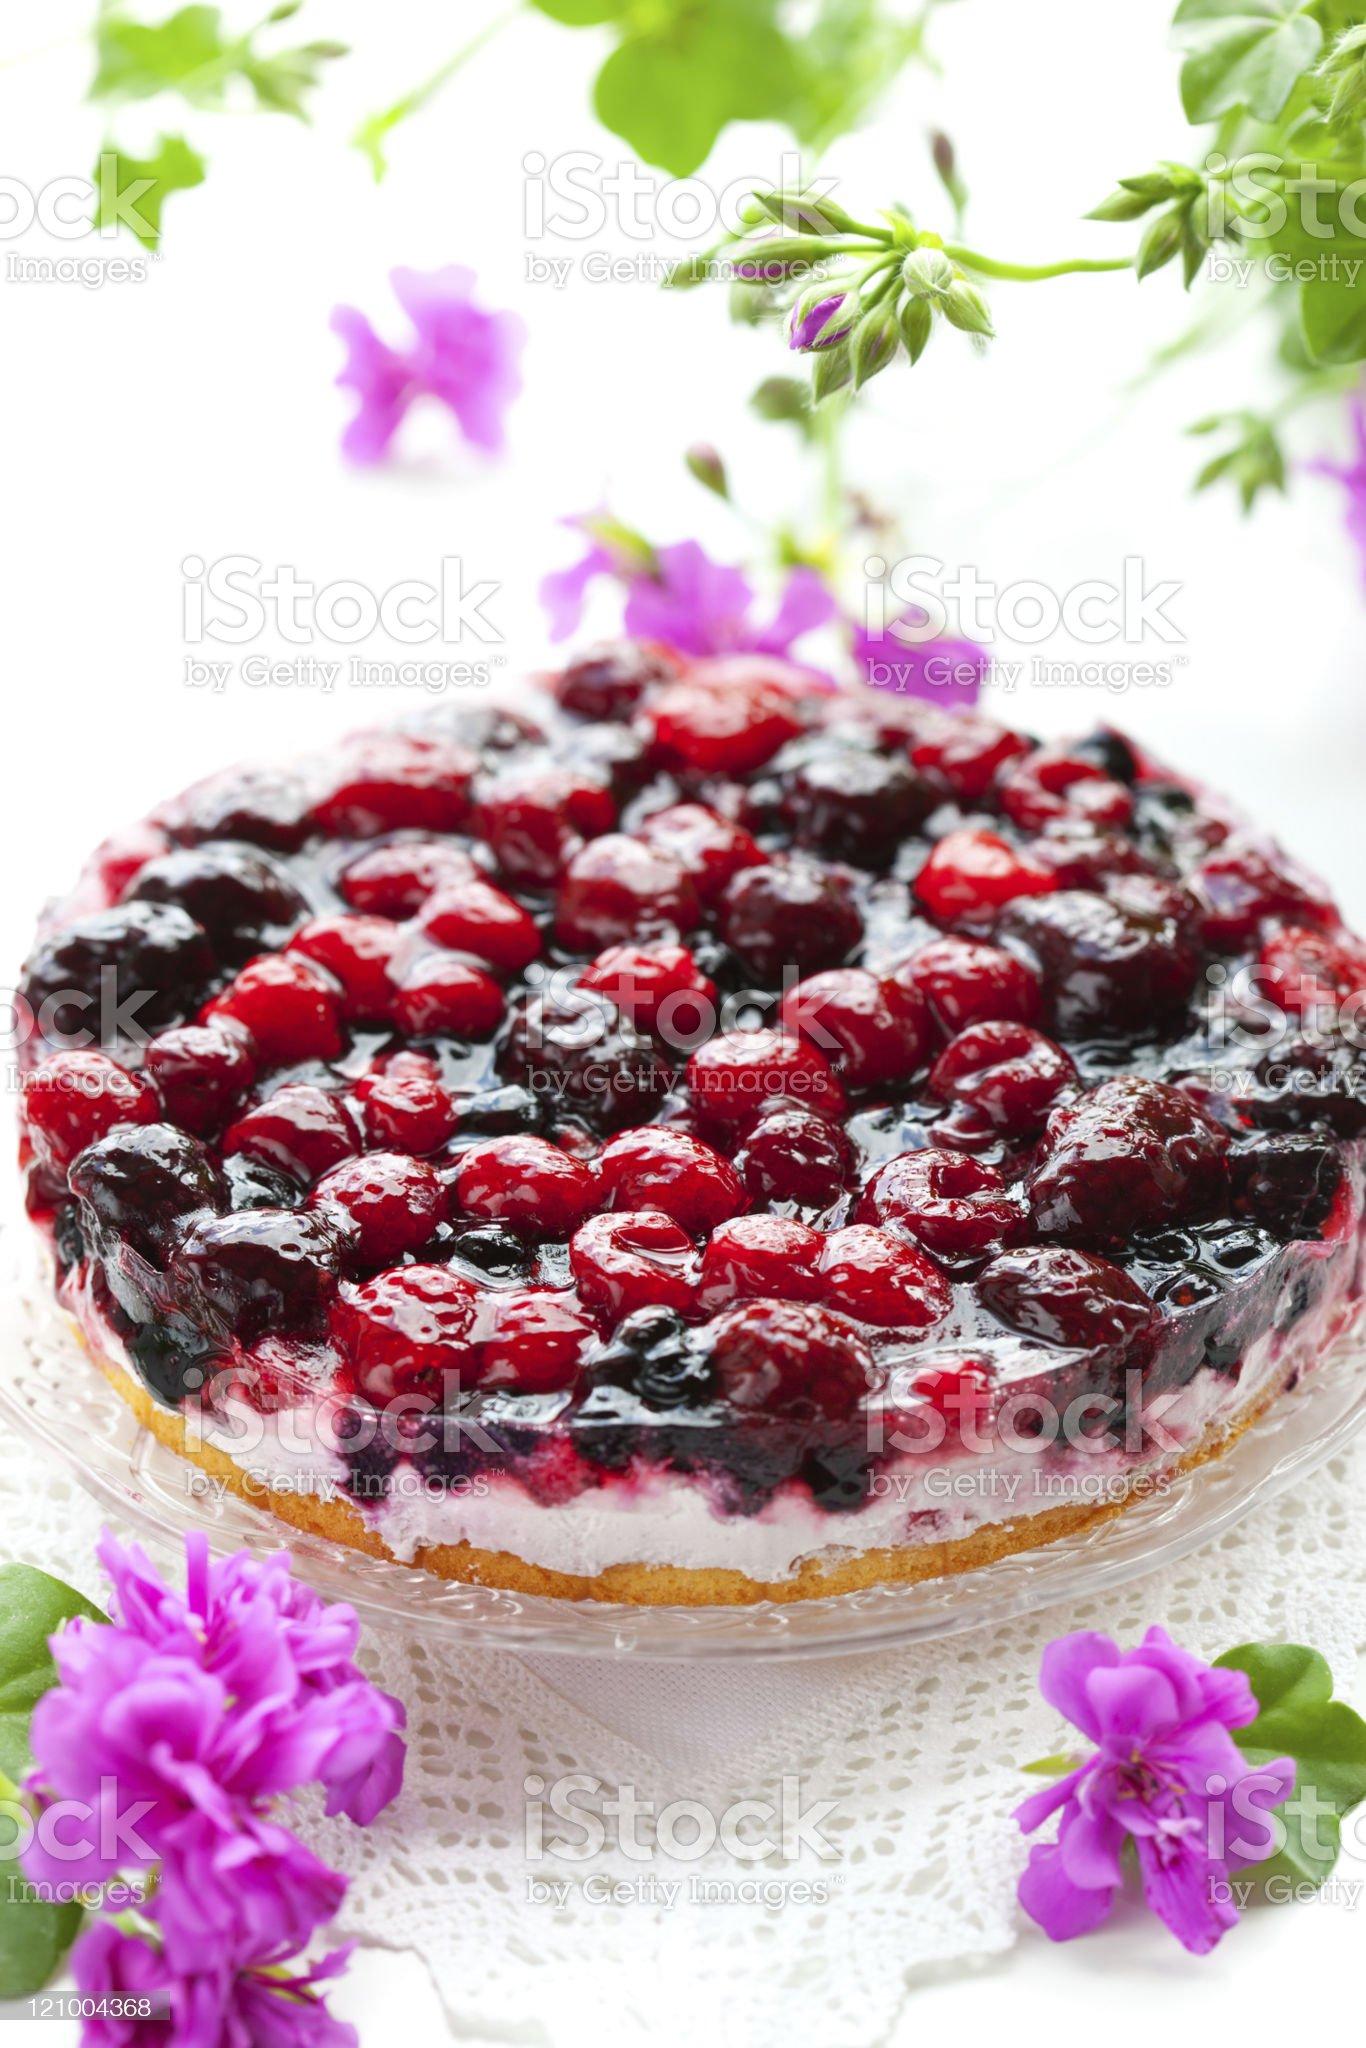 berry tart royalty-free stock photo